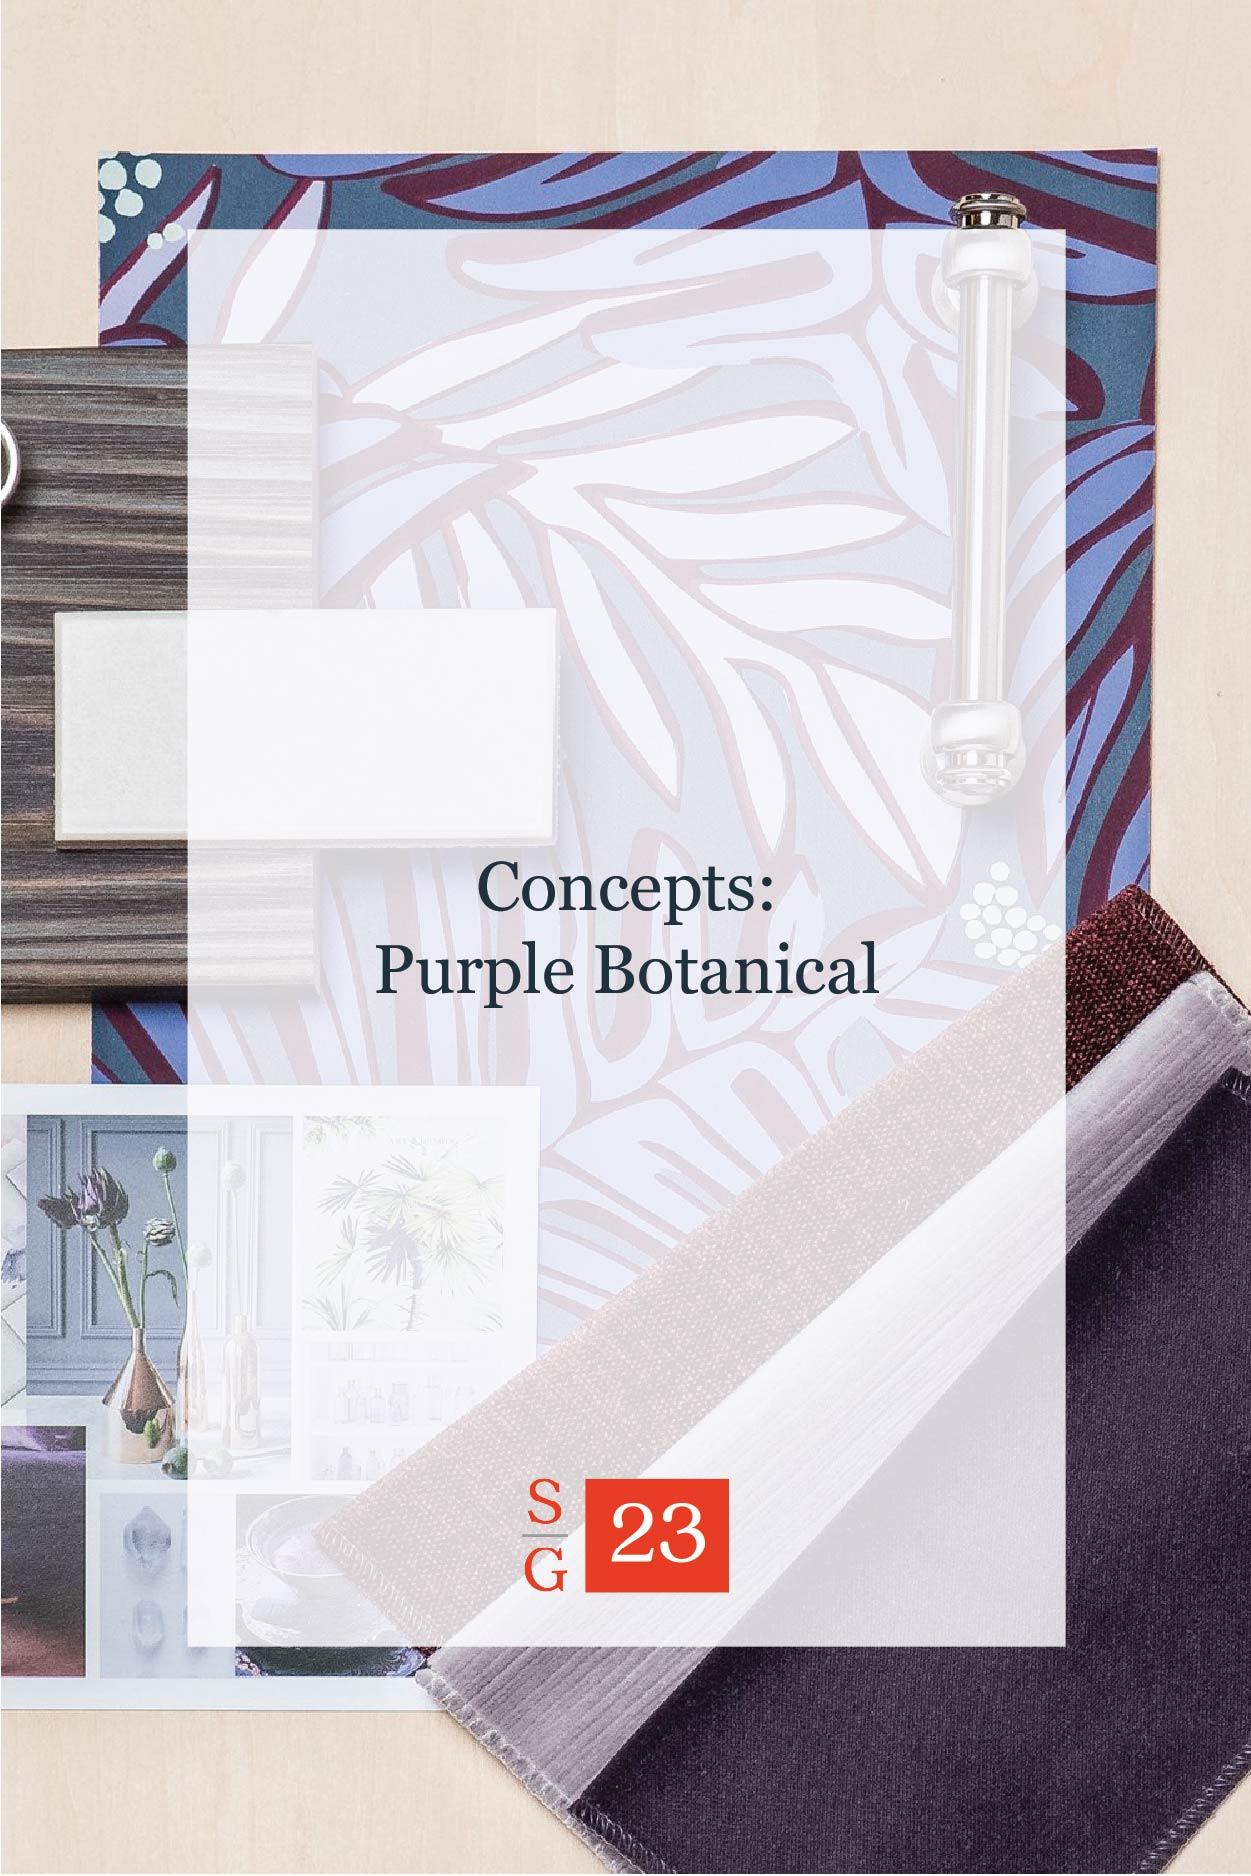 concept-purple-botanical-01.jpg